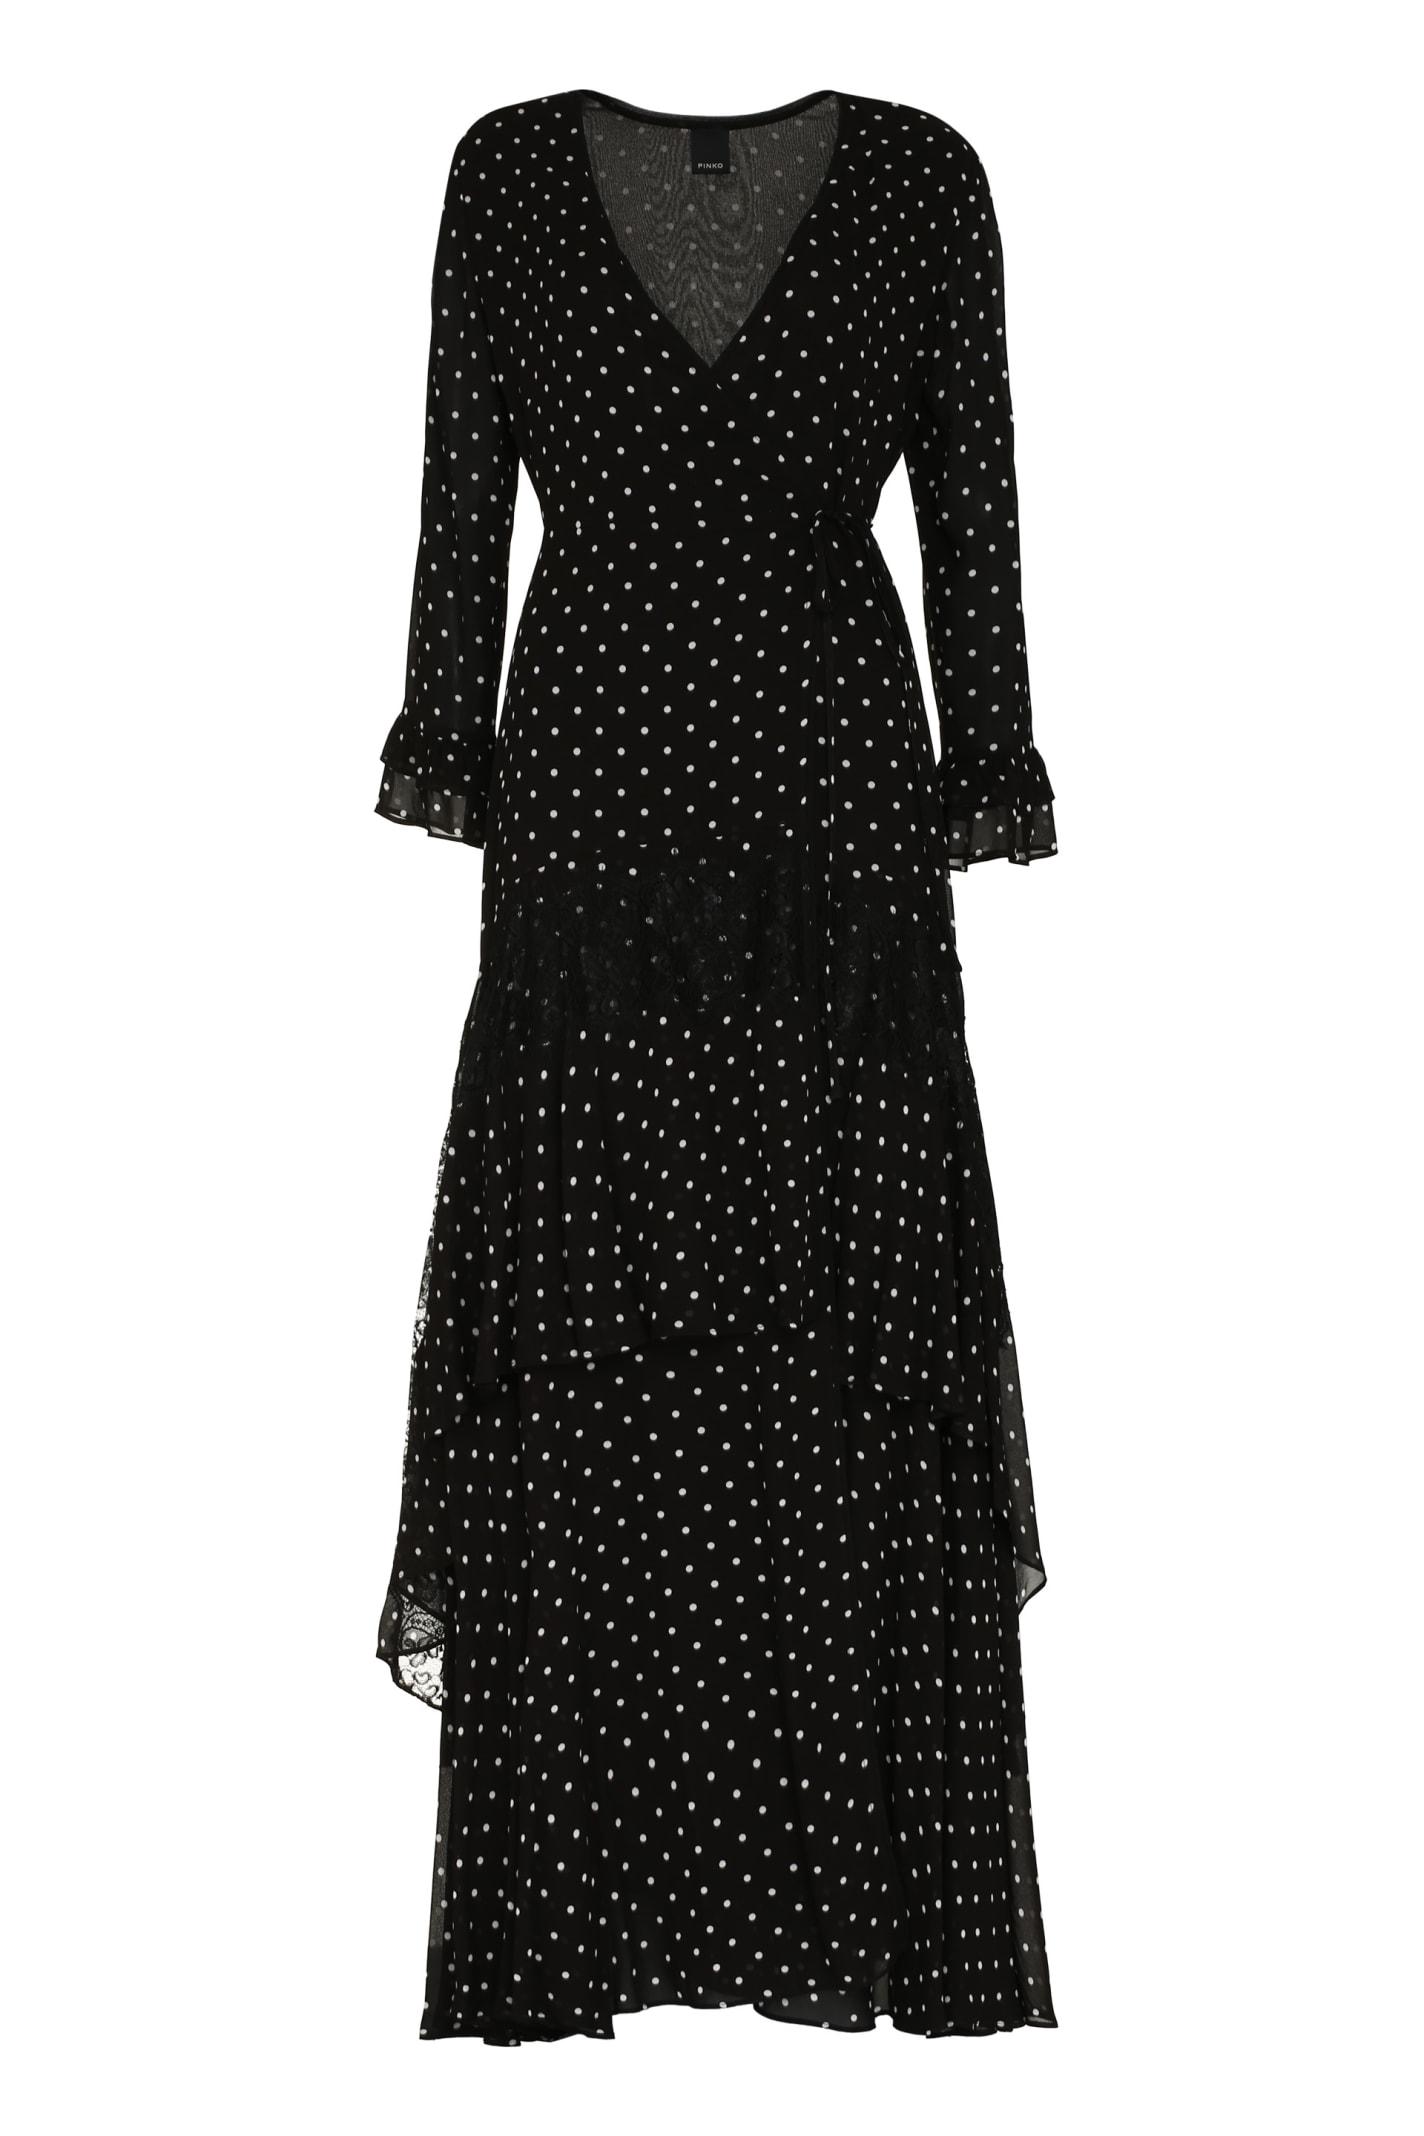 Pinko Cheesecake Polka Dot Print Long Dress